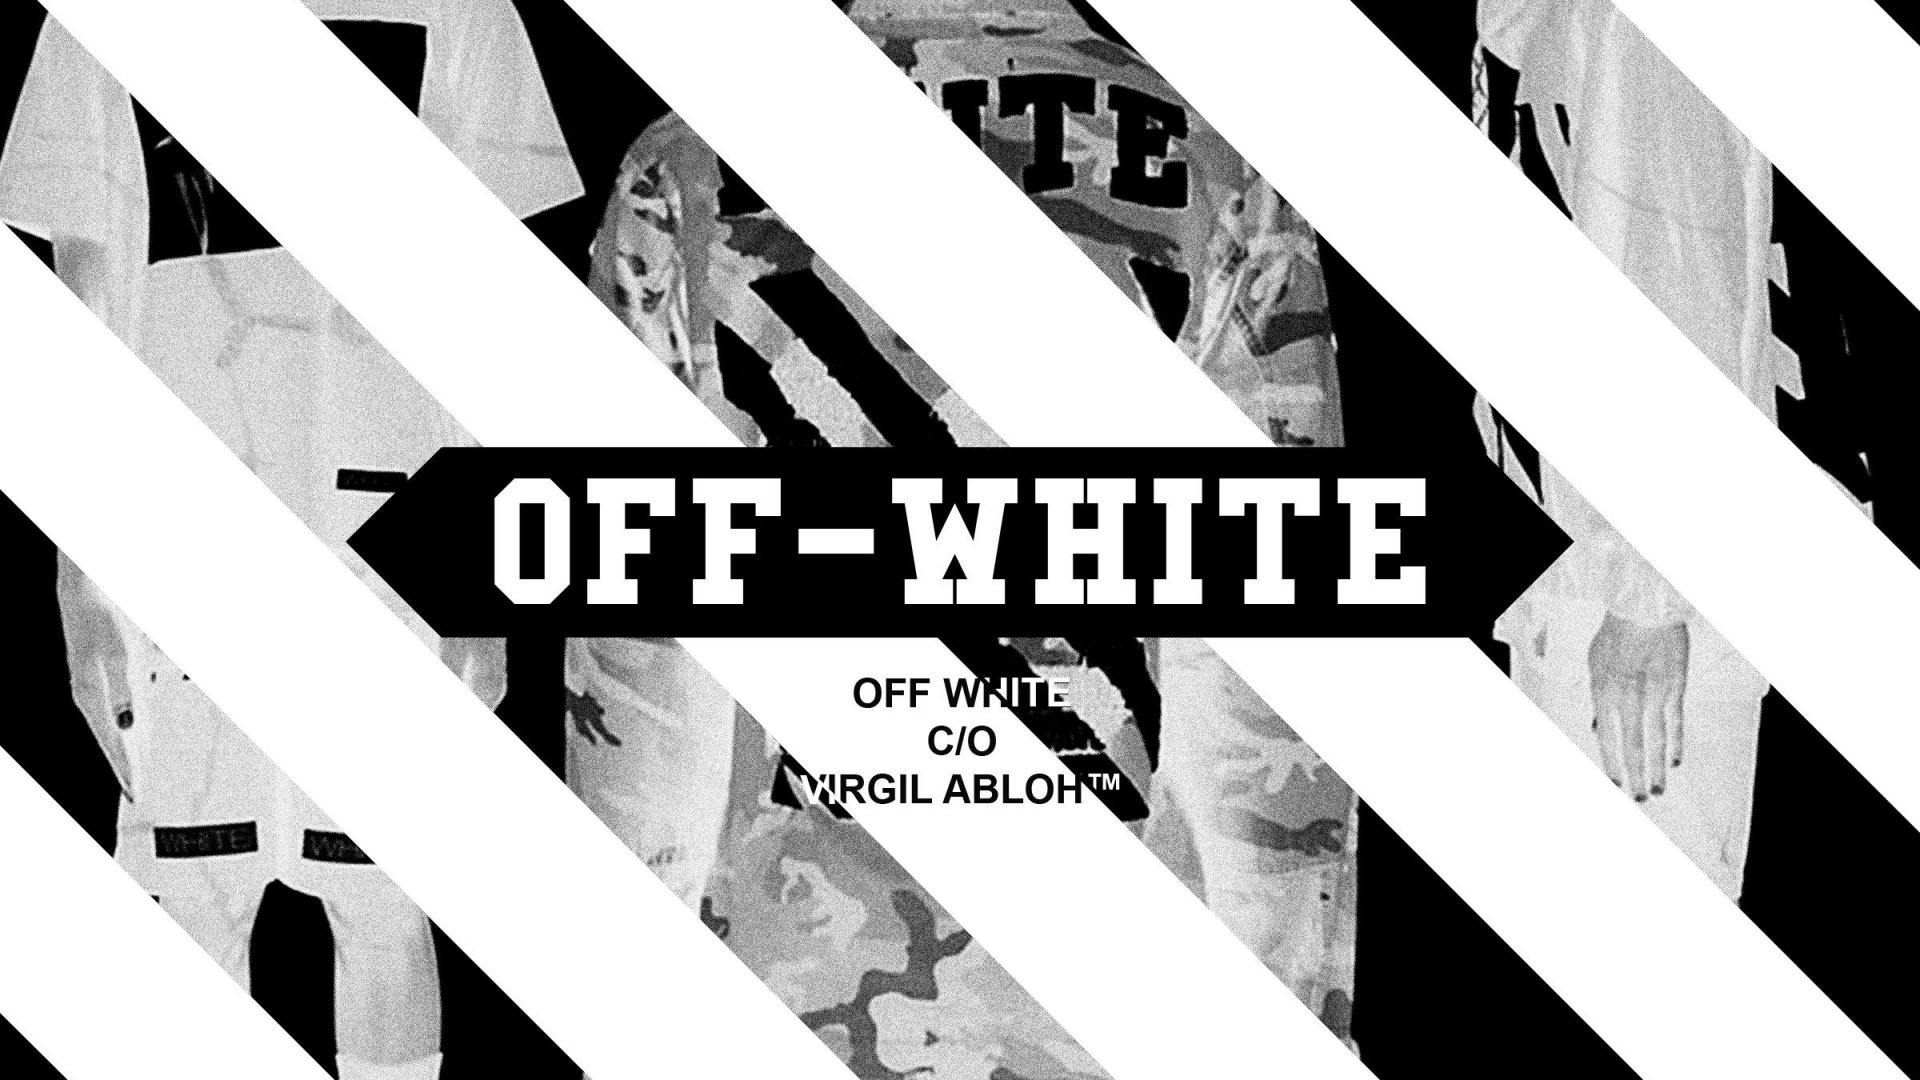 Off White hd wallpaper download